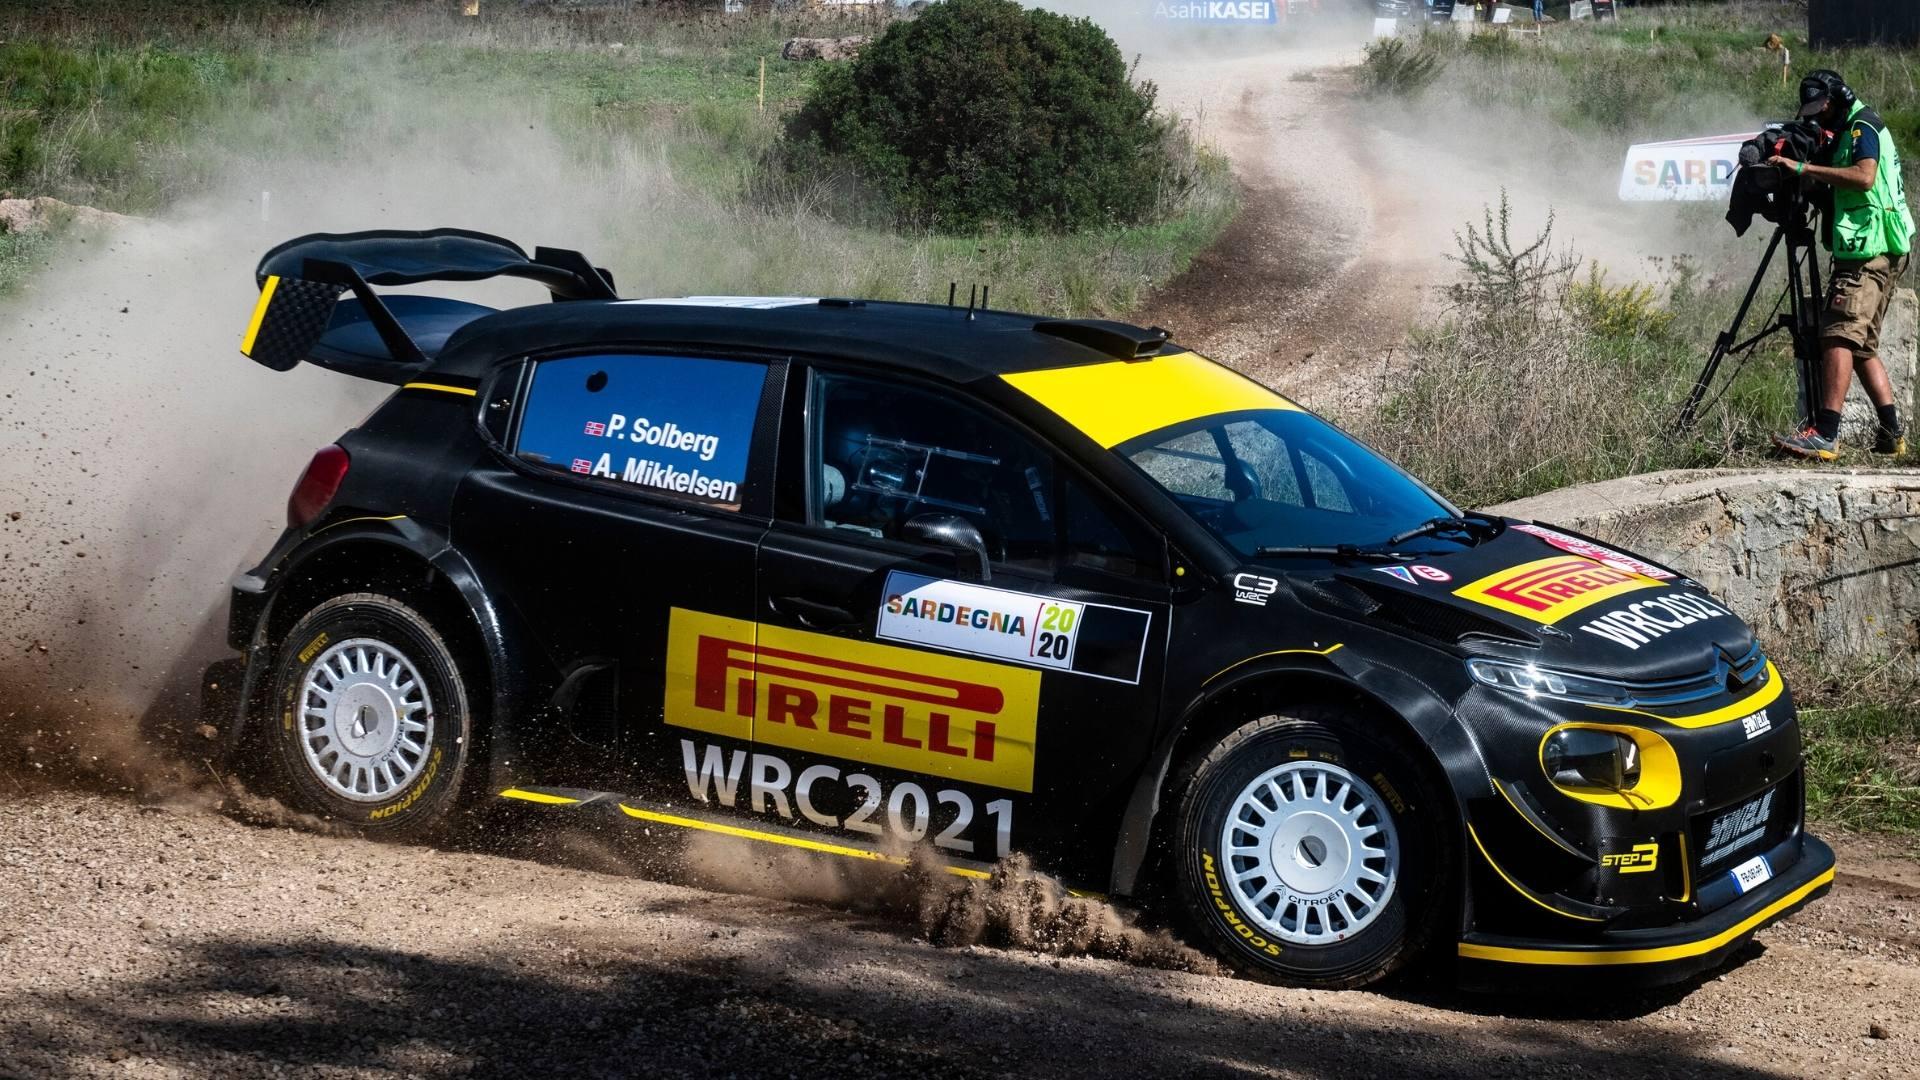 WRC: Rally d' Italia - Sardegna [8-10 Octubre] - Página 7 111020_Petter_SS16